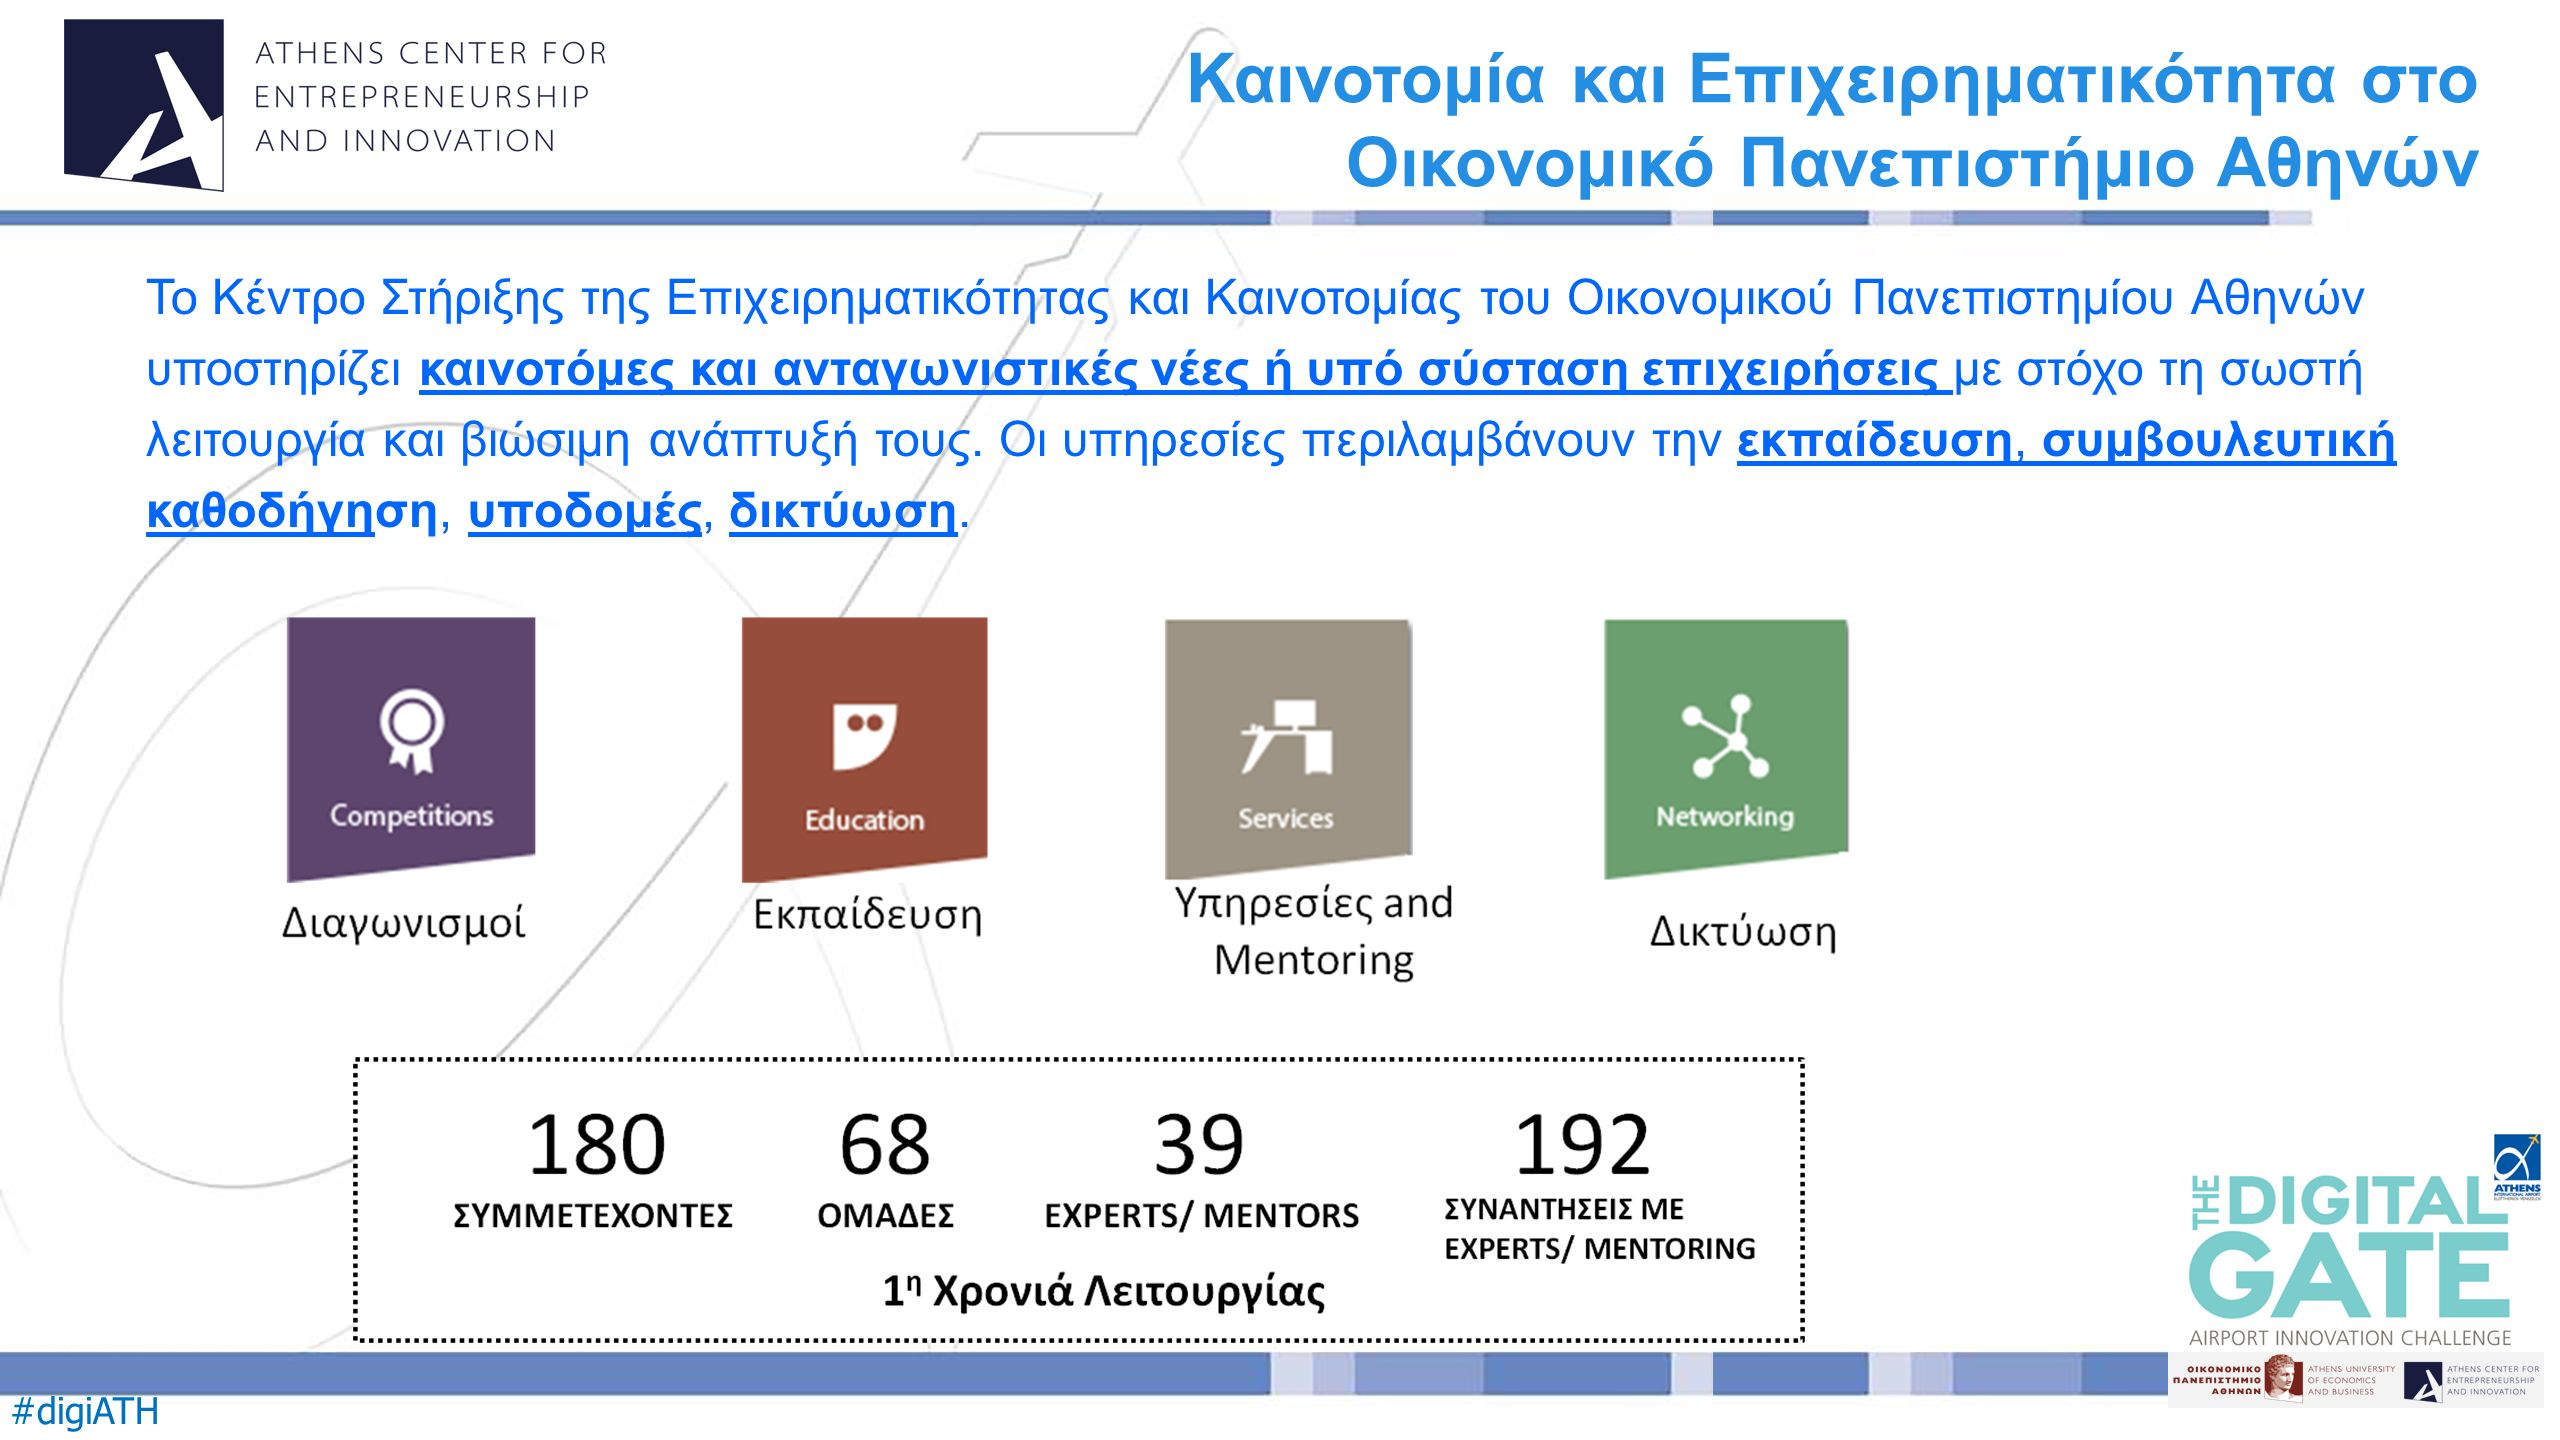 #digiATH Το Κέντρο Στήριξης της Επιχειρηματικότητας και Καινοτομίας του Οικονομικού Πανεπιστημίου Αθηνών υποστηρίζει καινοτόμες και ανταγωνιστικές νέες ή υπό σύσταση επιχειρήσεις με στόχο τη σωστή λειτουργία και βιώσιμη ανάπτυξή τους.